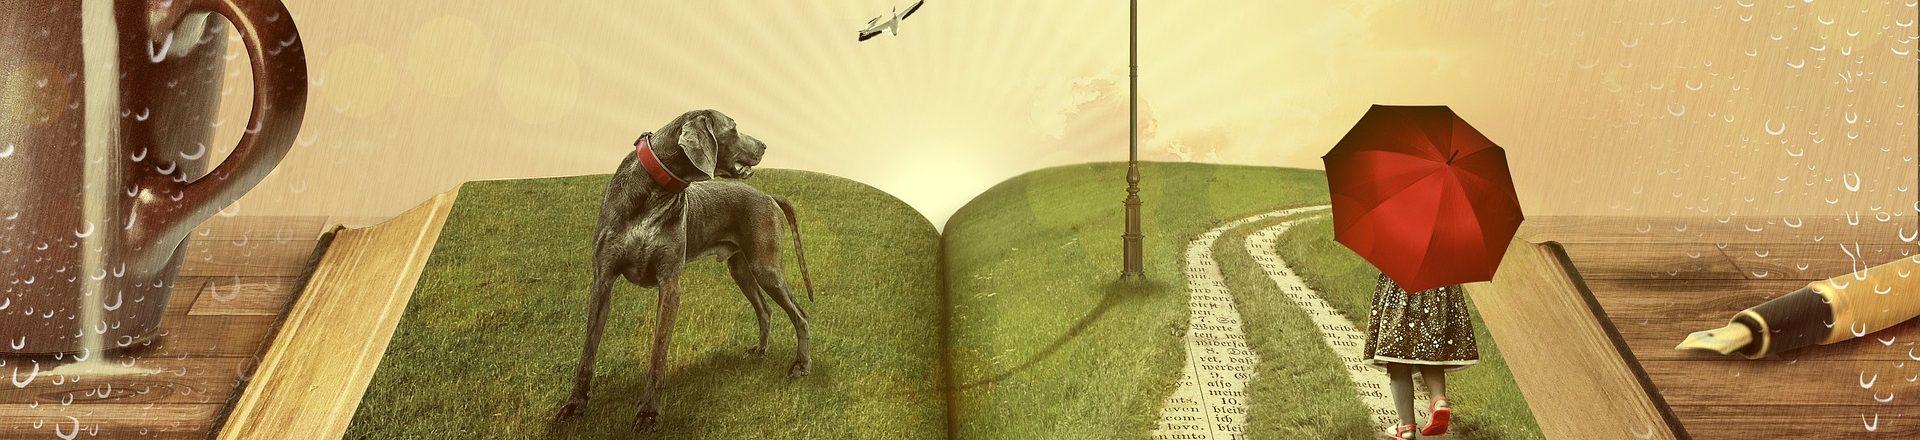 Dream Meadow Press